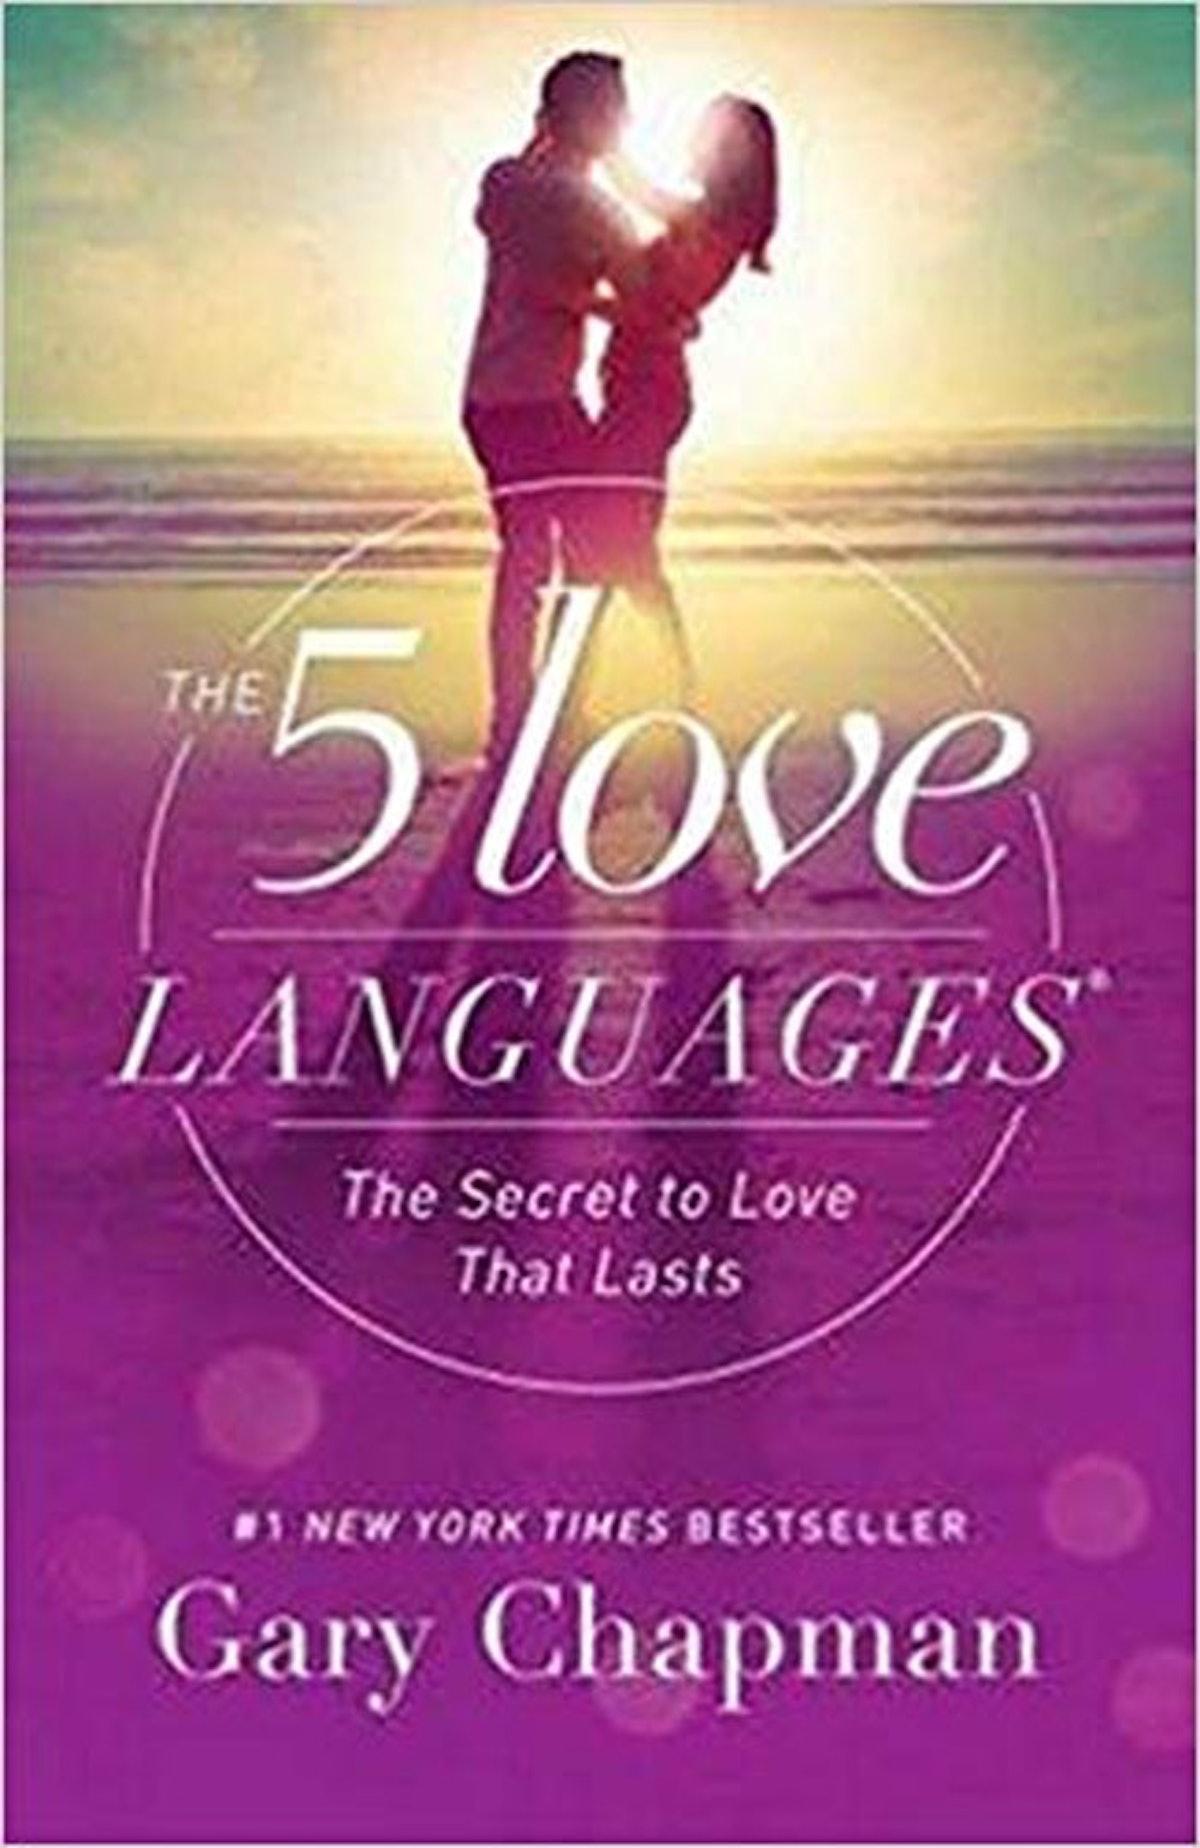 5 Love Languages: The Secret To Love That Lasts